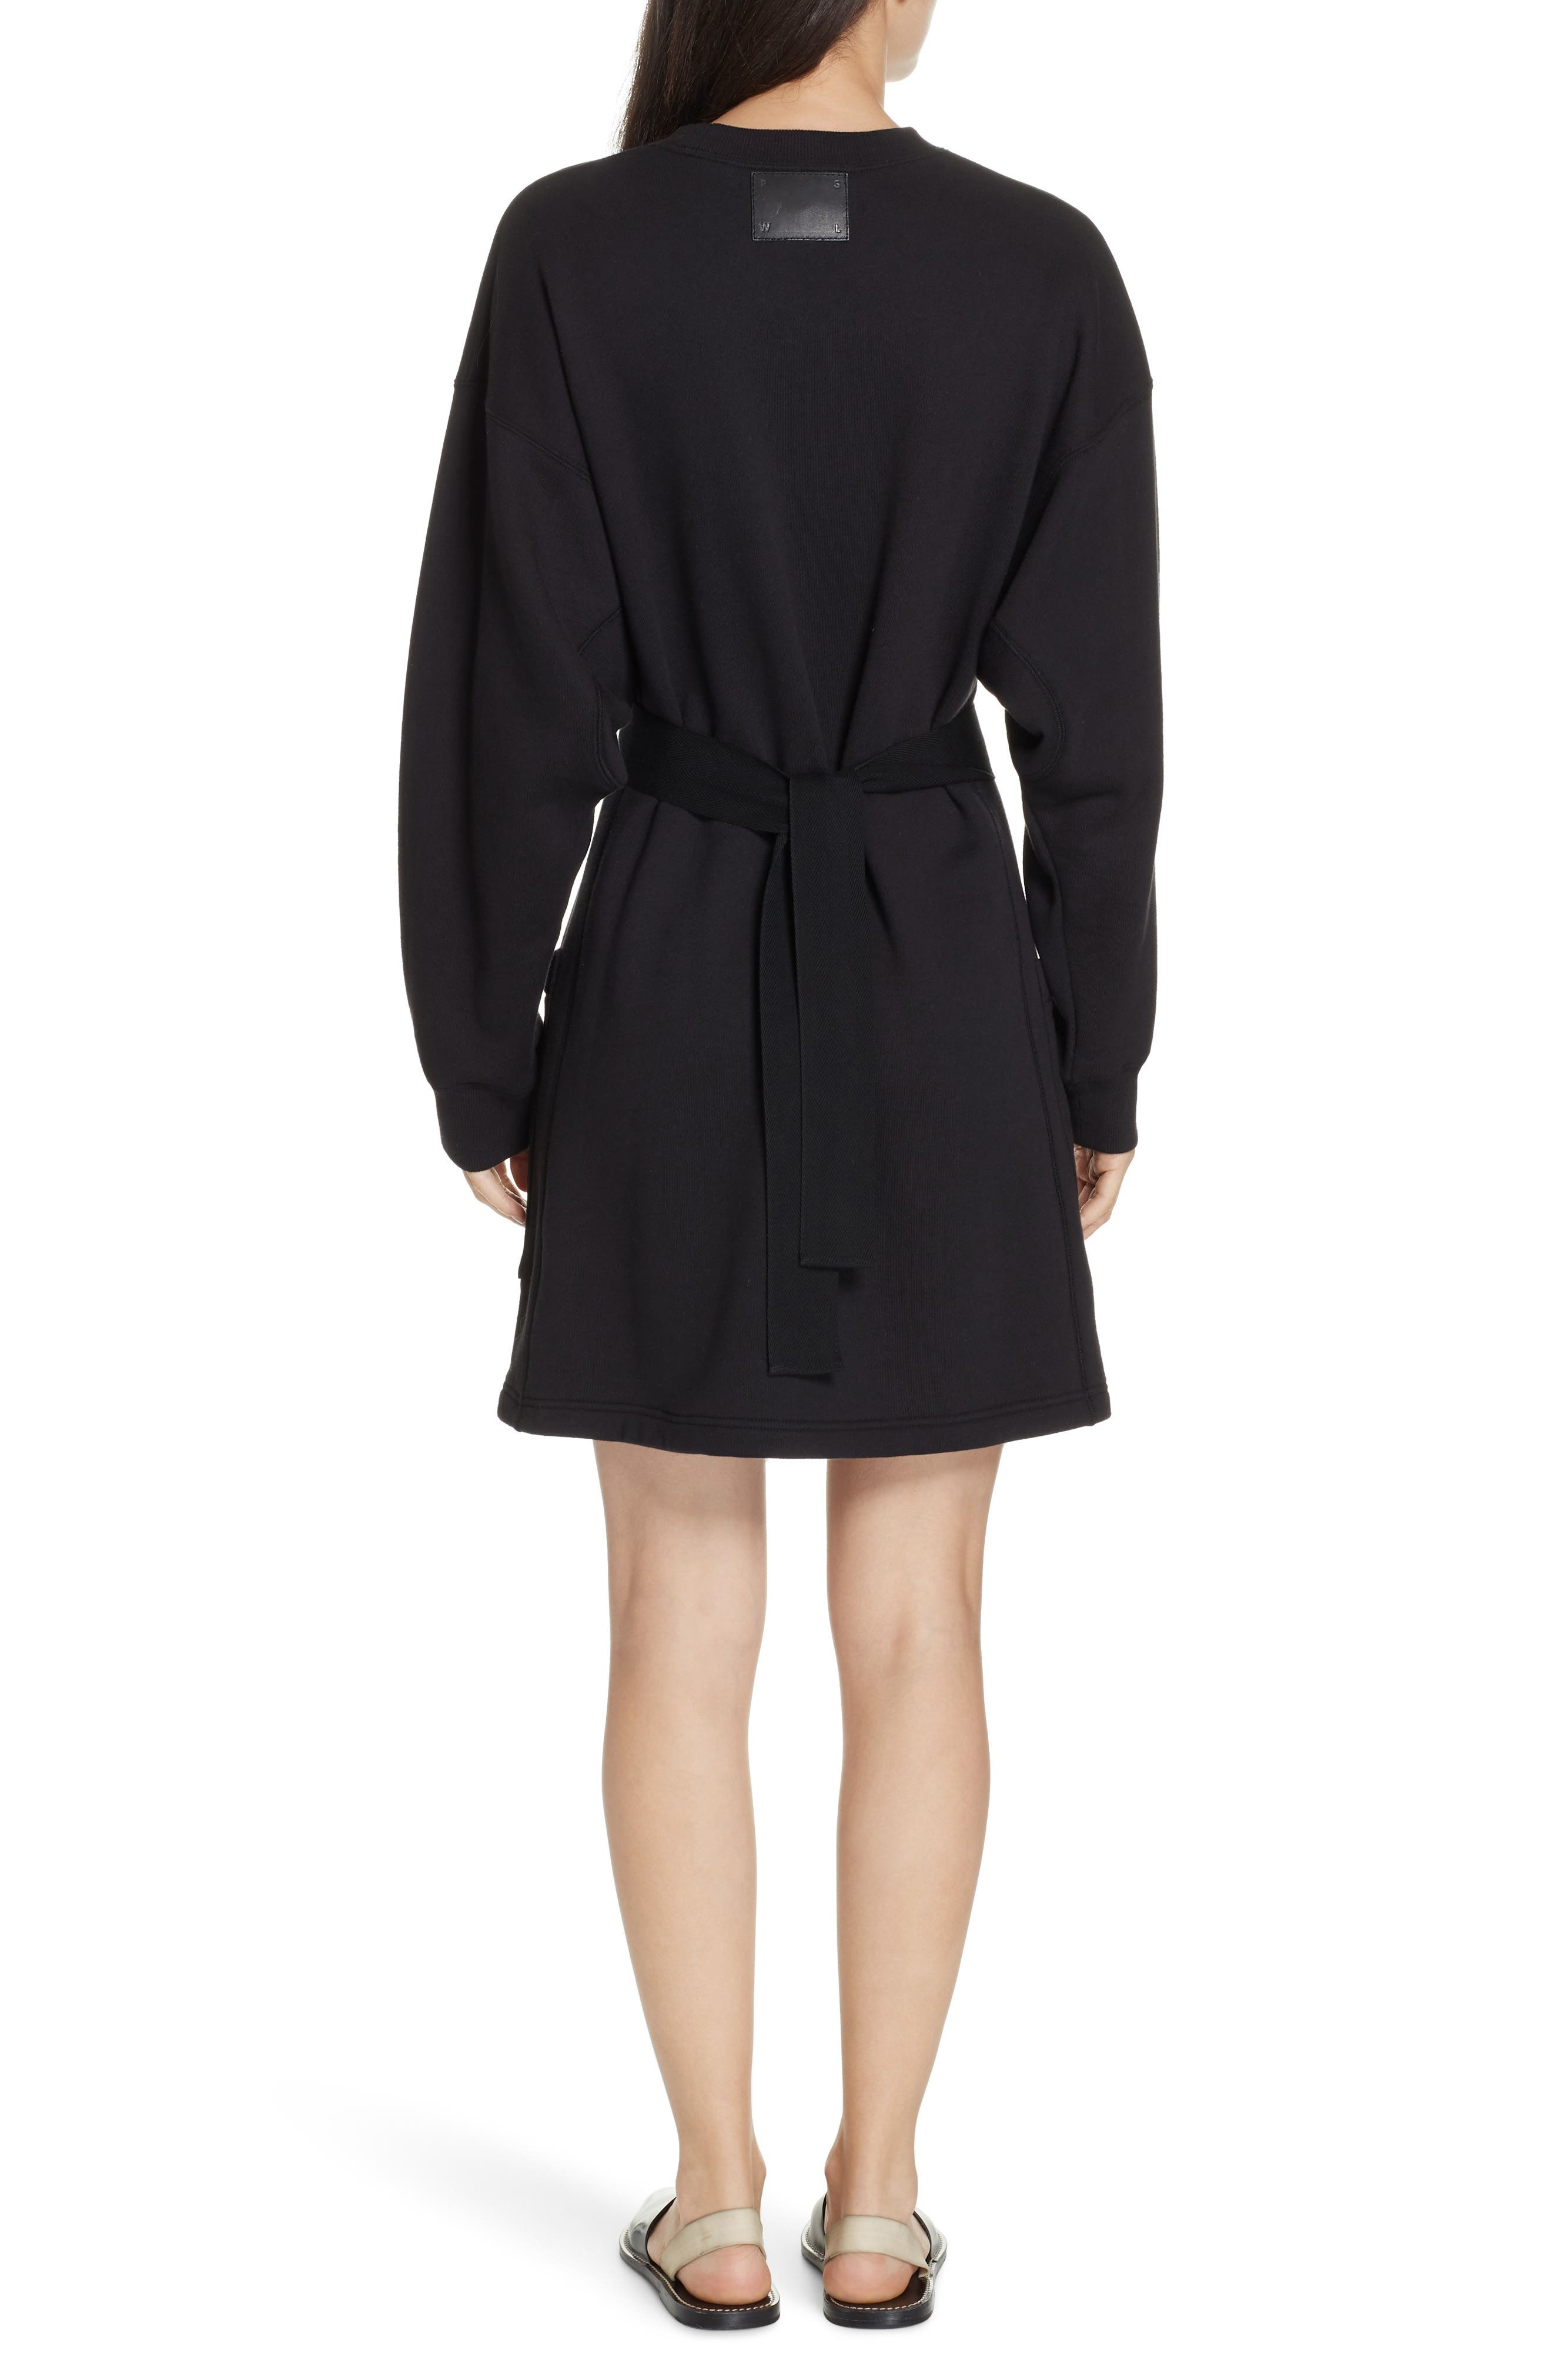 PSWL Belted Sweatshirt Dress,                             Alternate thumbnail 2, color,                             BLACK